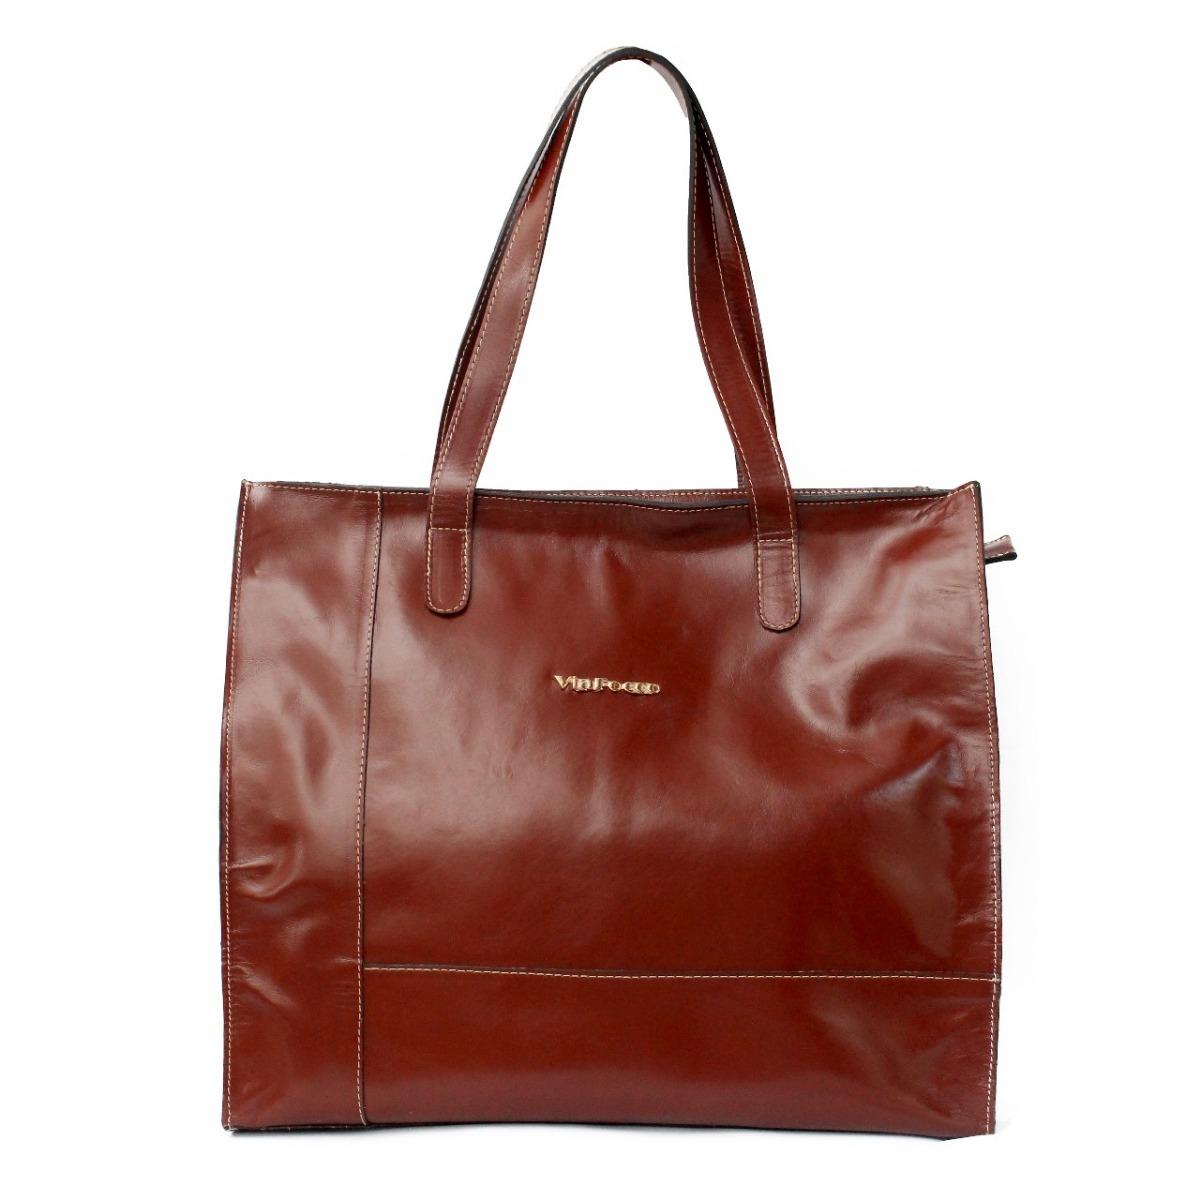 78524d314 bolsas femininas de couro legítimo grande modelo sacola. Carregando zoom.